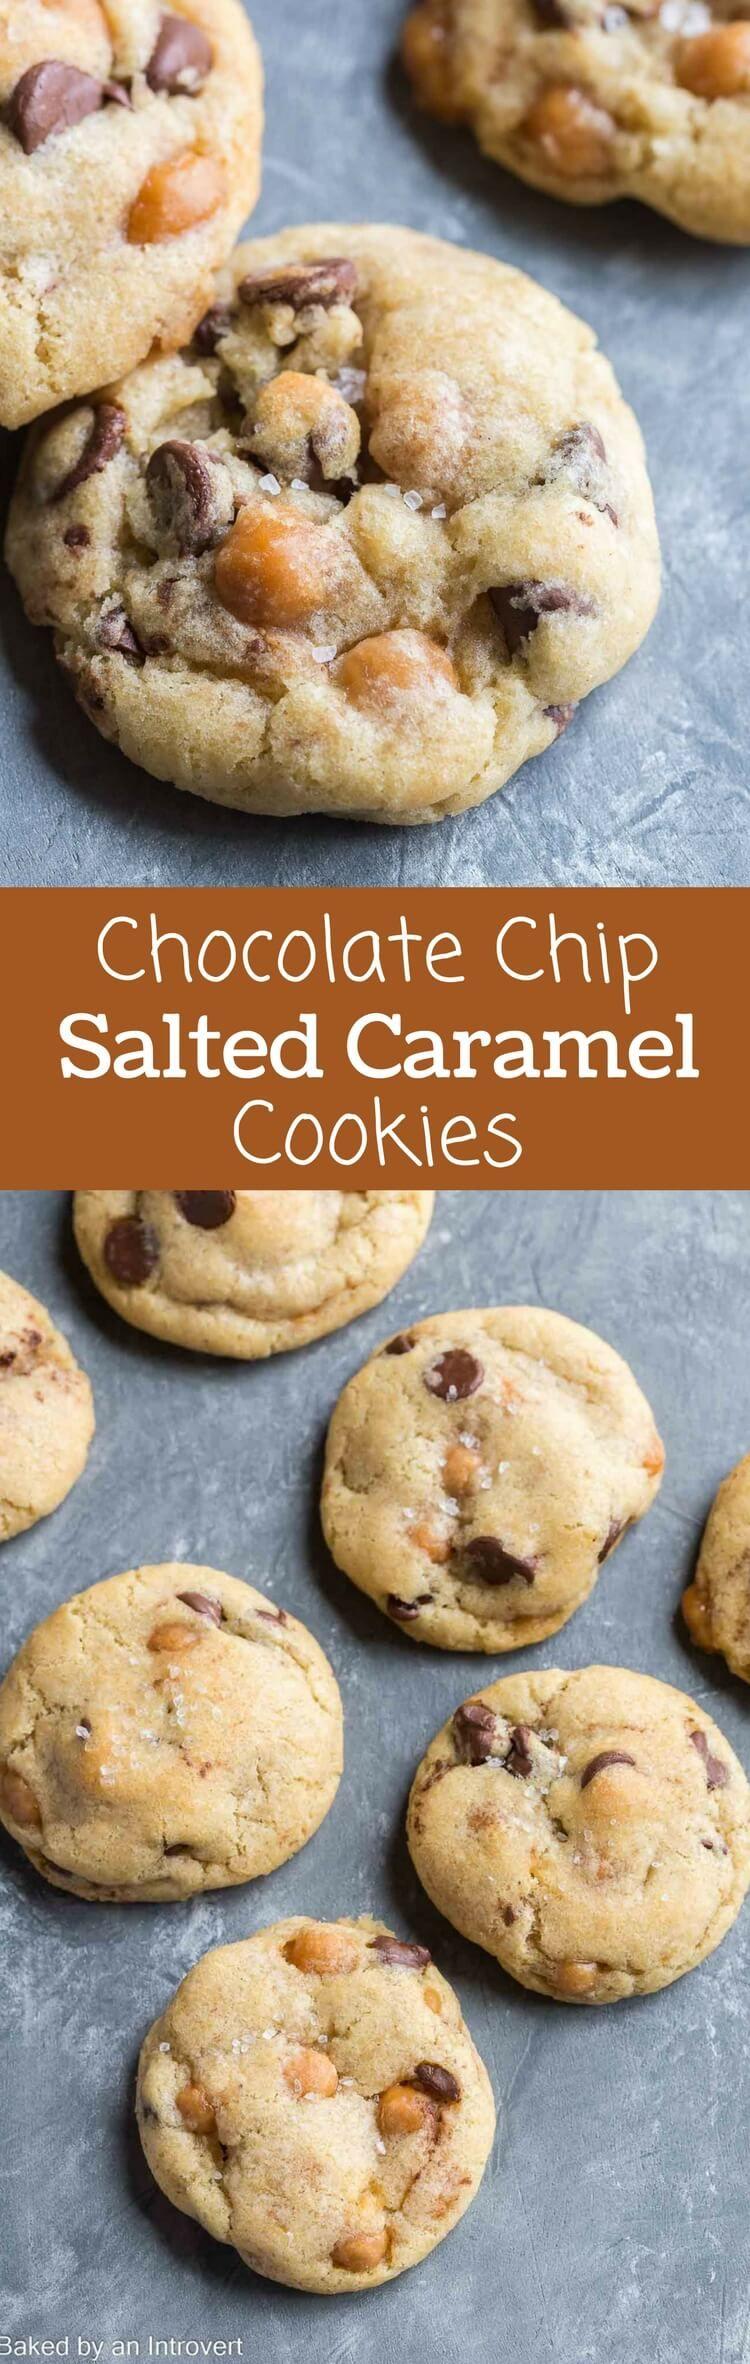 Soft baked kekse rezept